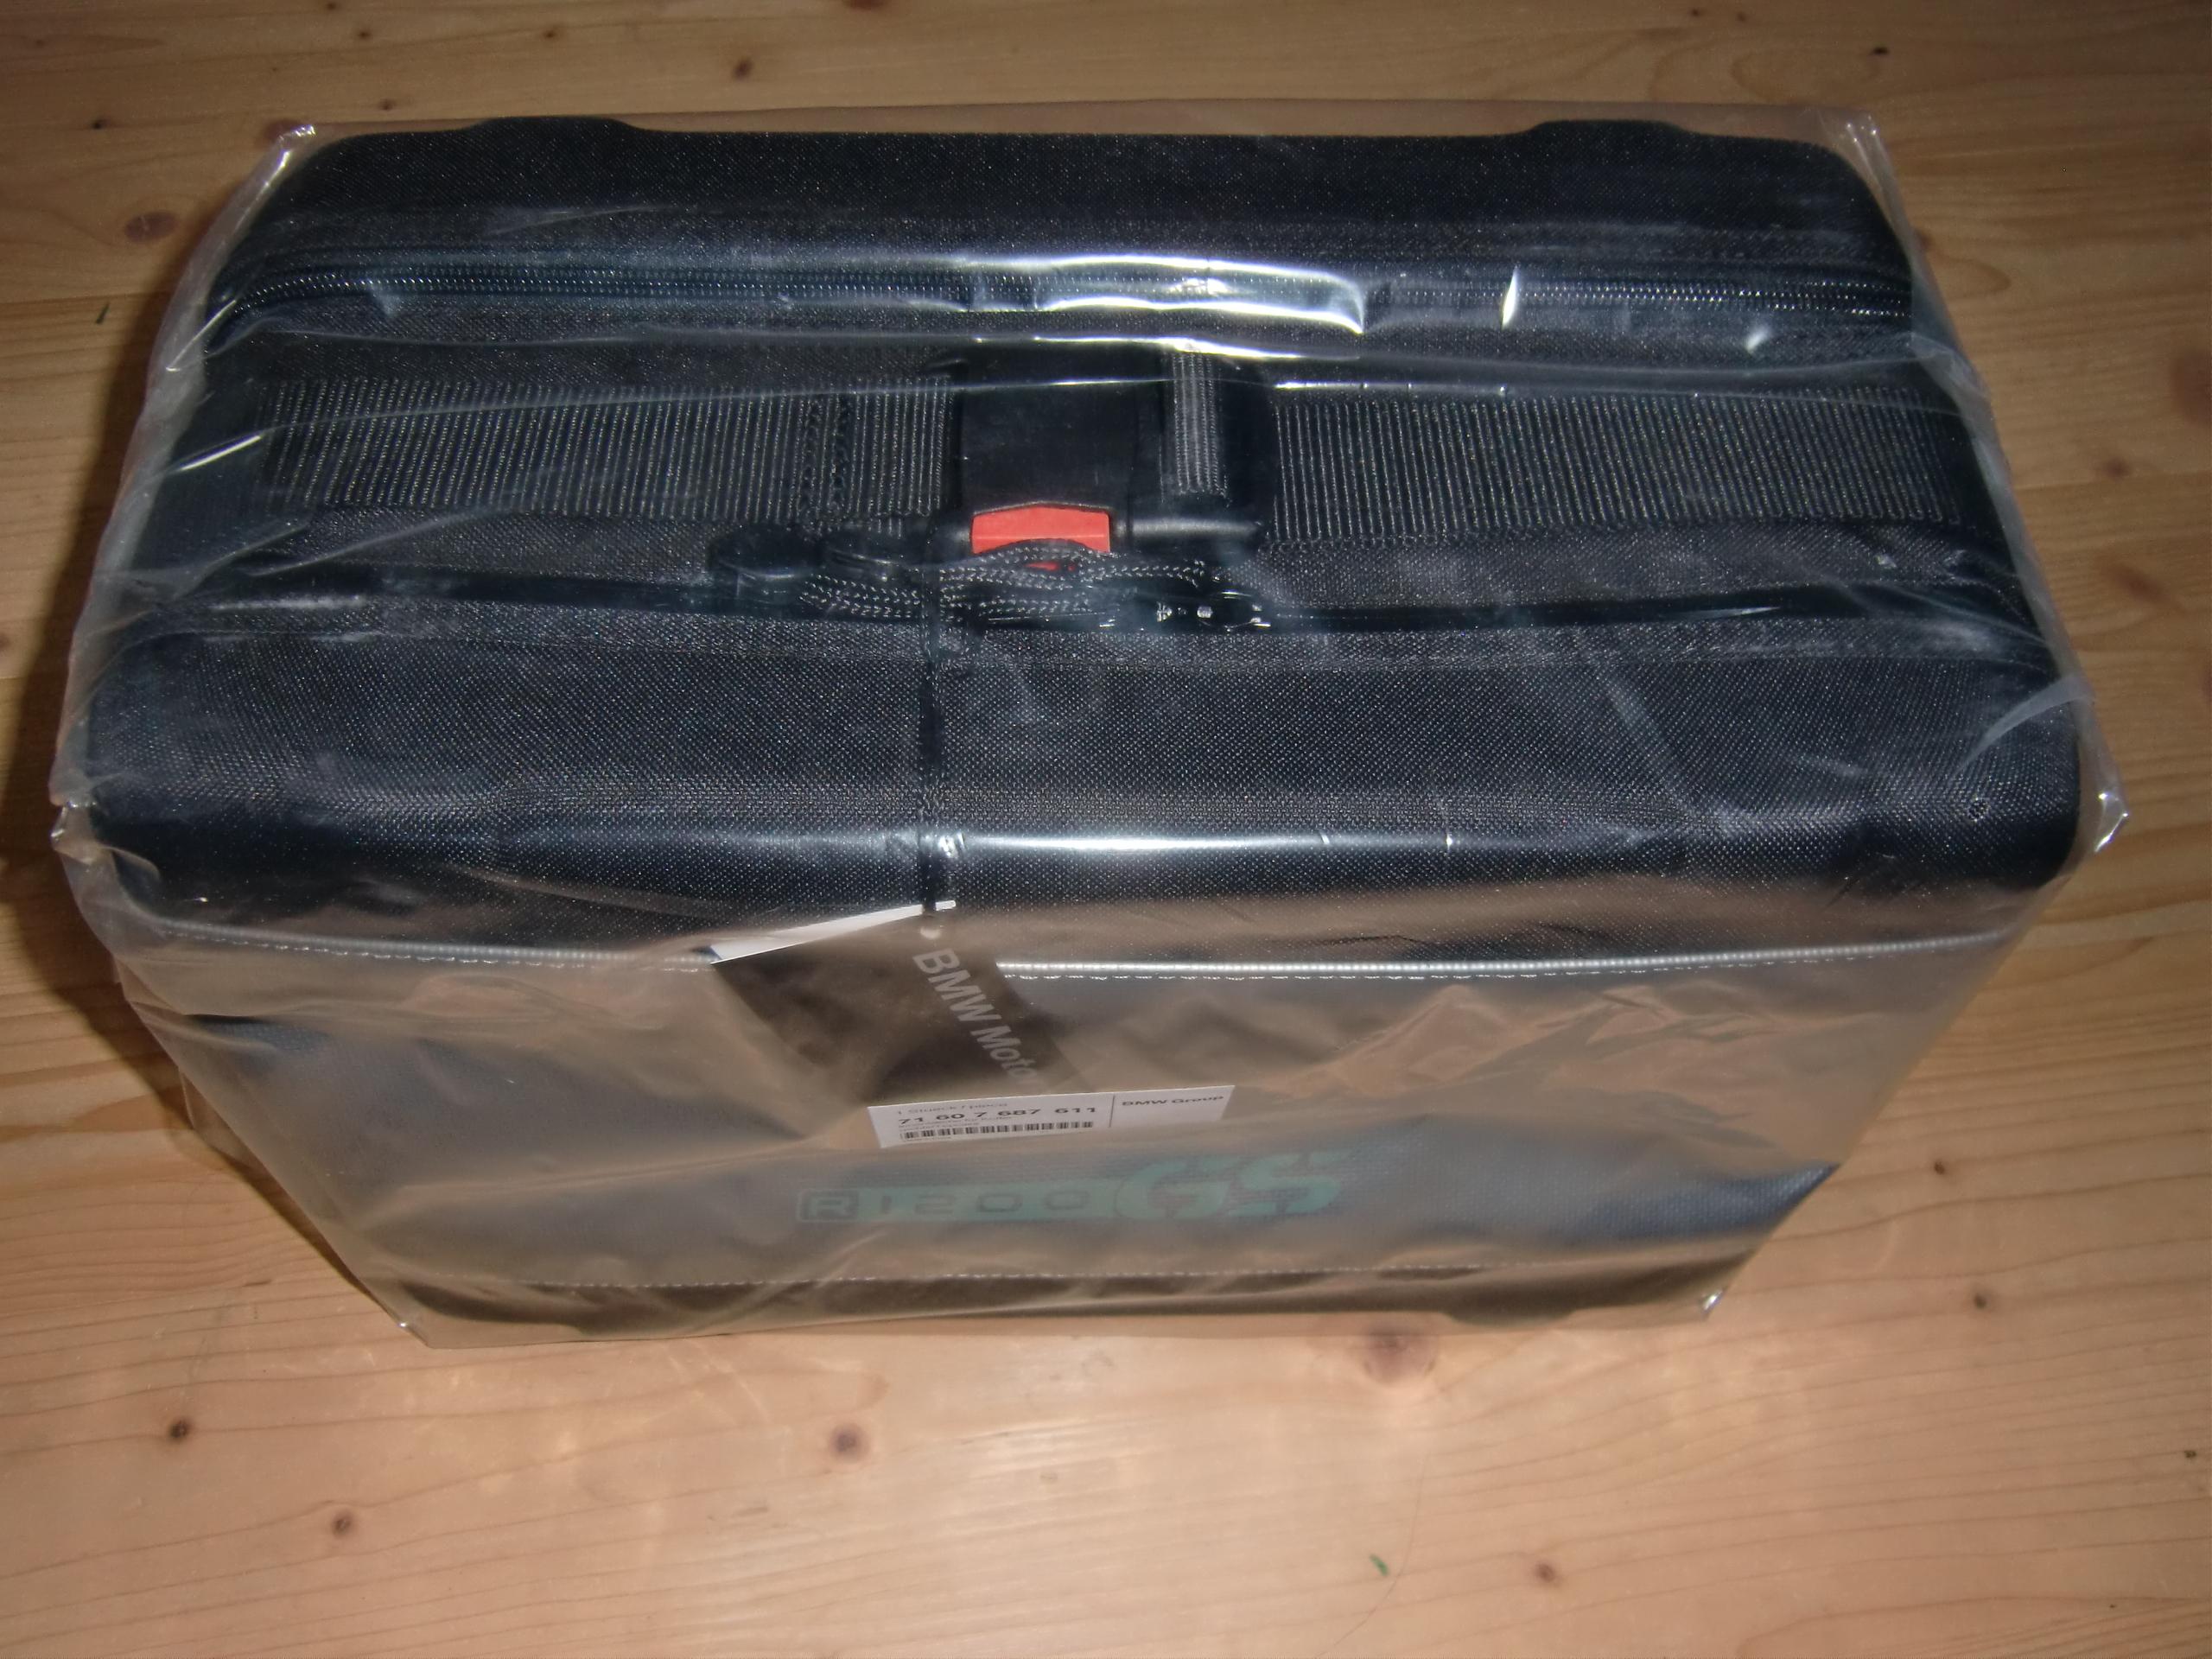 bmw innentasche rechts gro oder top case f r vario. Black Bedroom Furniture Sets. Home Design Ideas